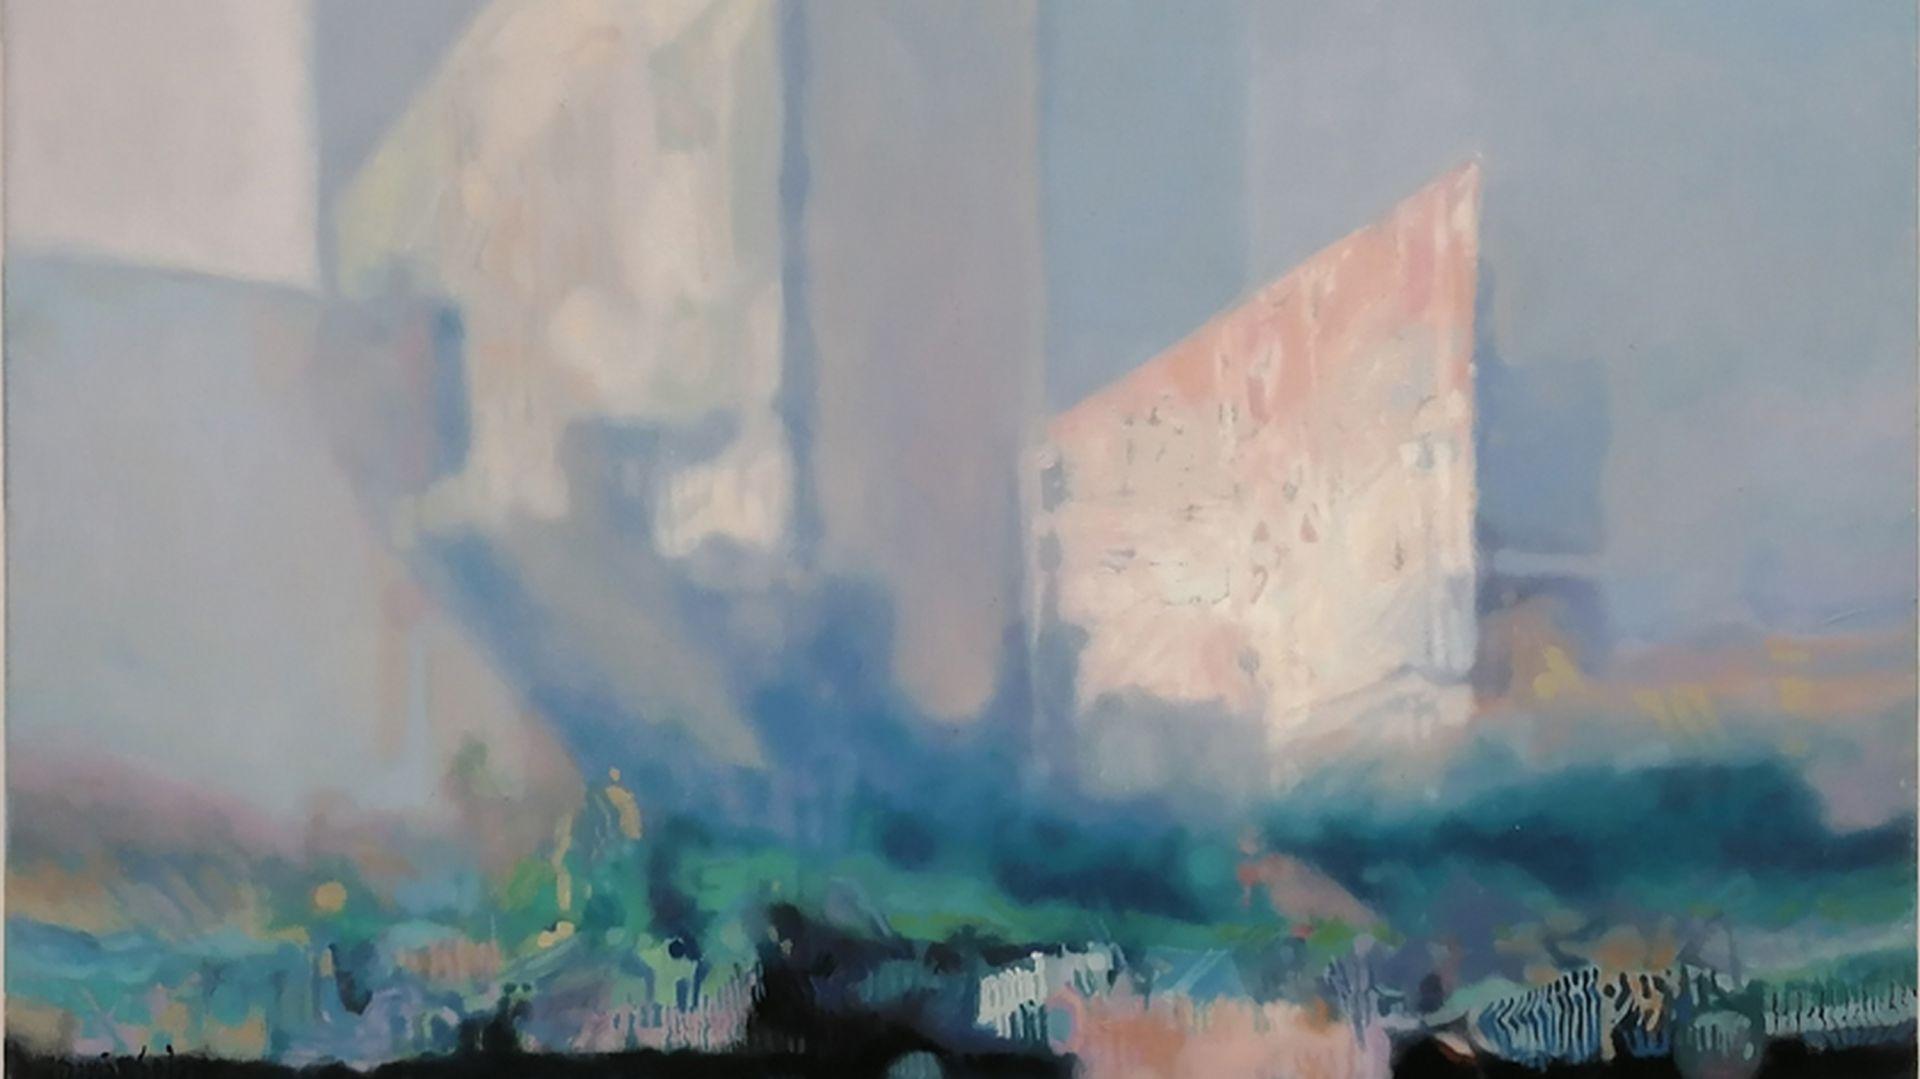 Daria Solar, Sky-Scrapers in the Mist, olej na płótnie, 50 x 70 cm, Leonarda Art Gallery, 3500 zł